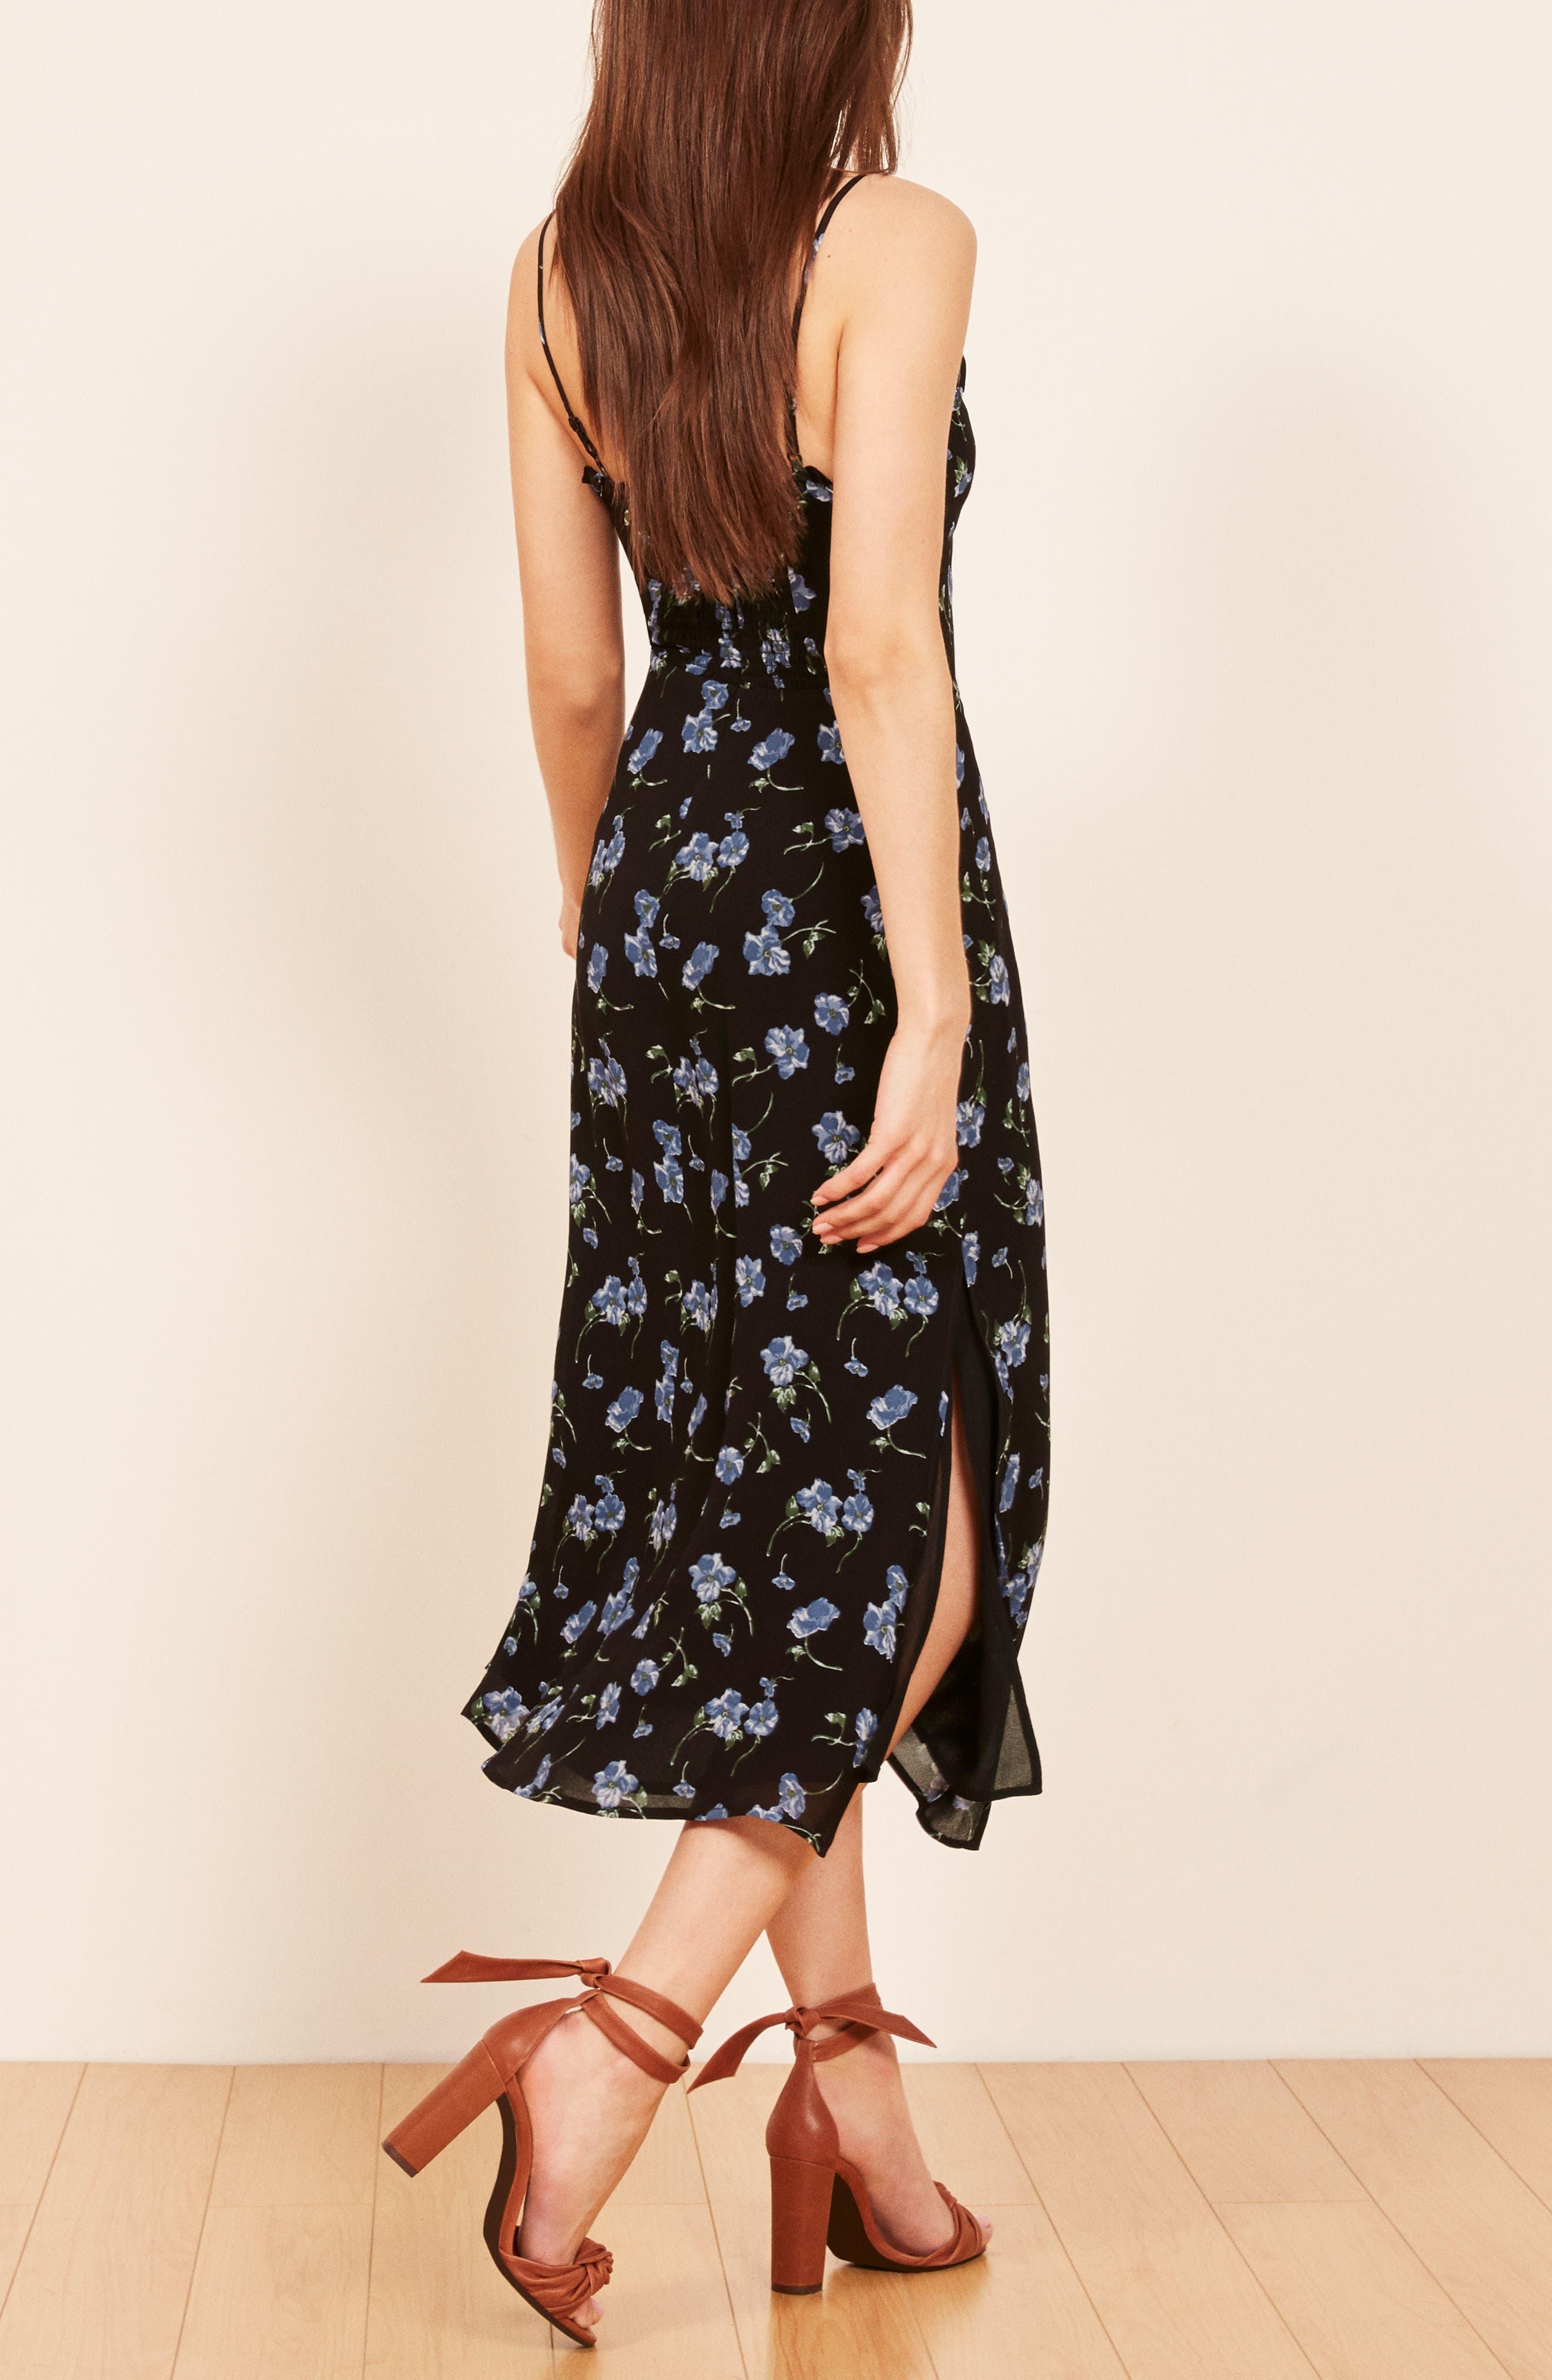 REFORMATION, Cassandra Floral Dress, Alternate thumbnail 4, color, 001